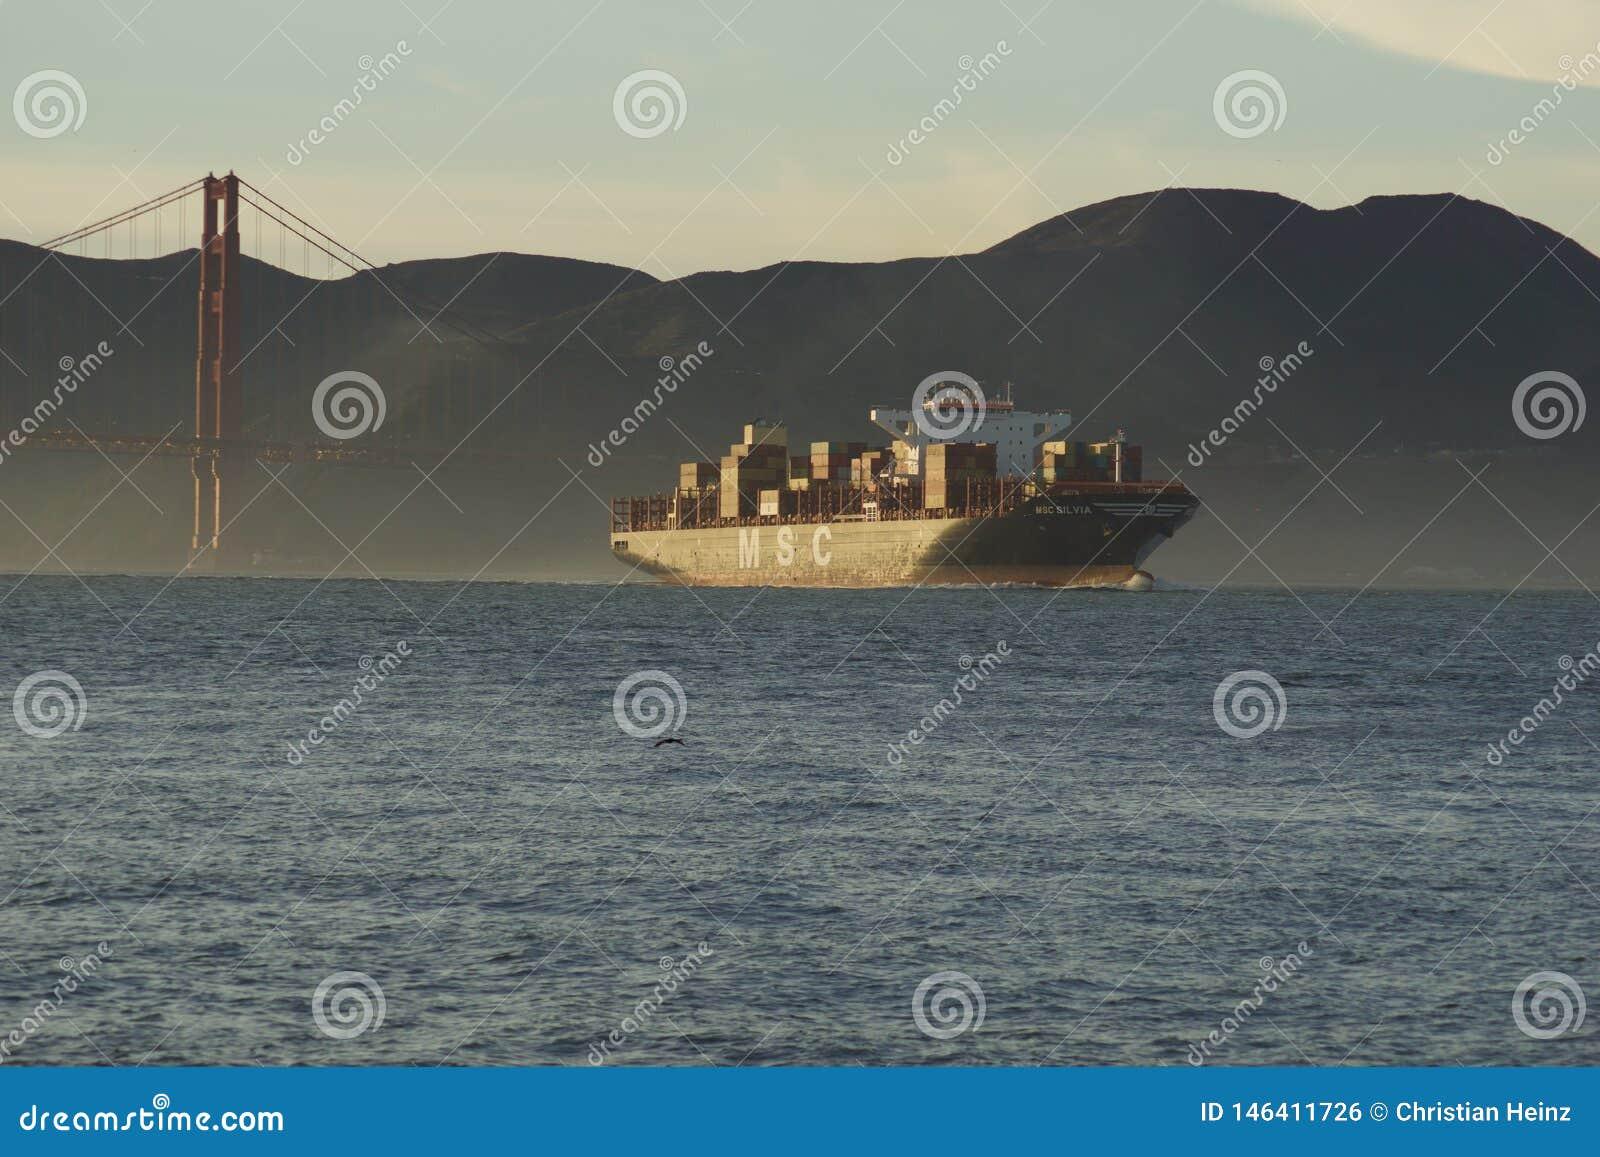 SAN FRANCISCO, CALIFORNIA, ESTADOS UNIDOS - 25 de noviembre de 2018: Buque de carga del MSC SILVIA que inscribe al San Francisco